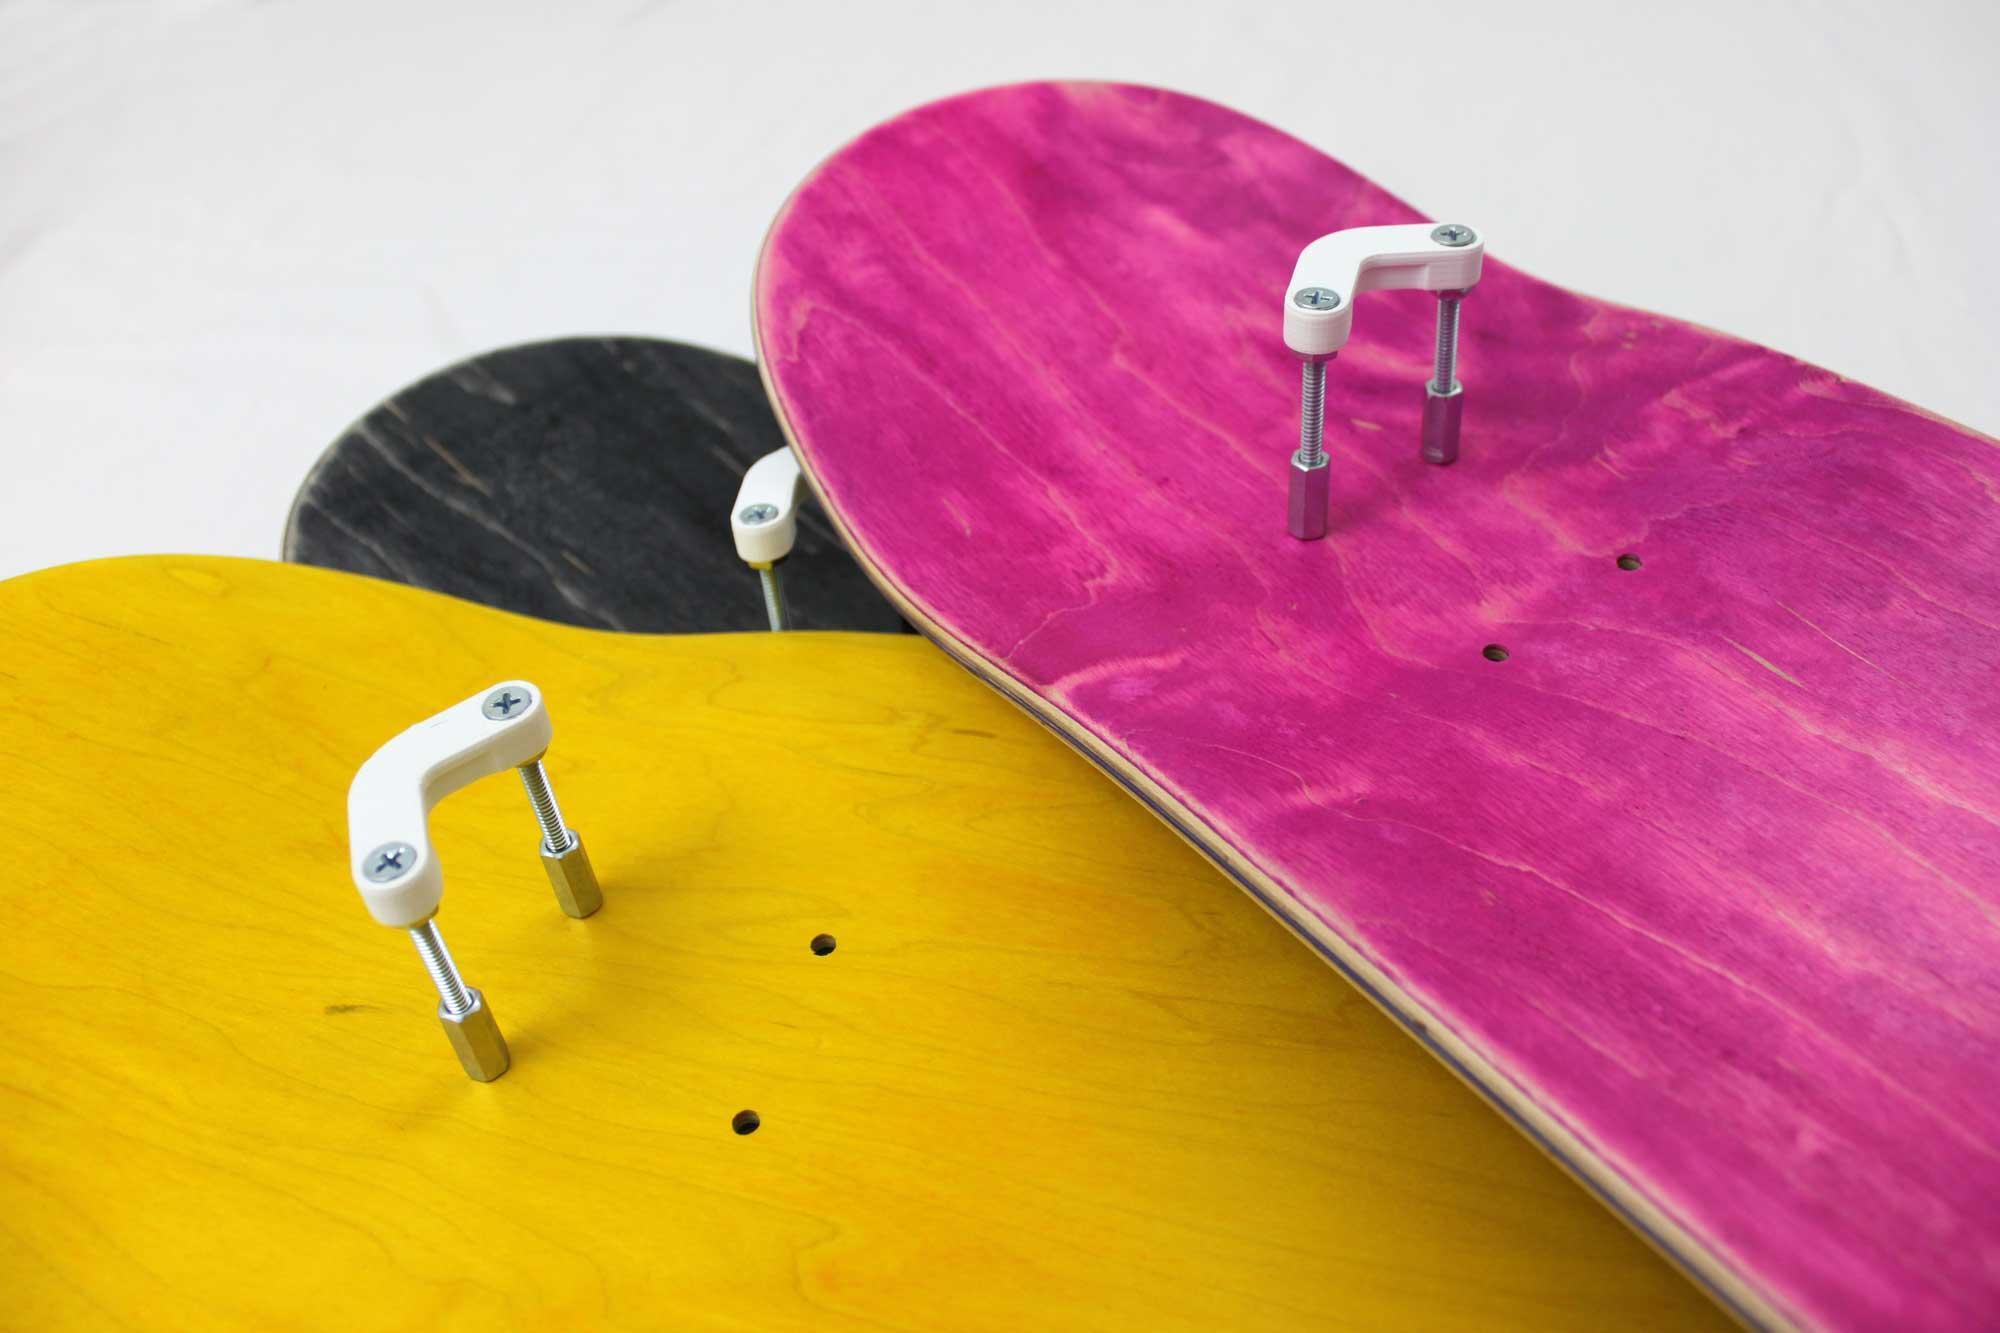 08-vhs-polaroid-skateboard-detail-graphics-design-photo-deck